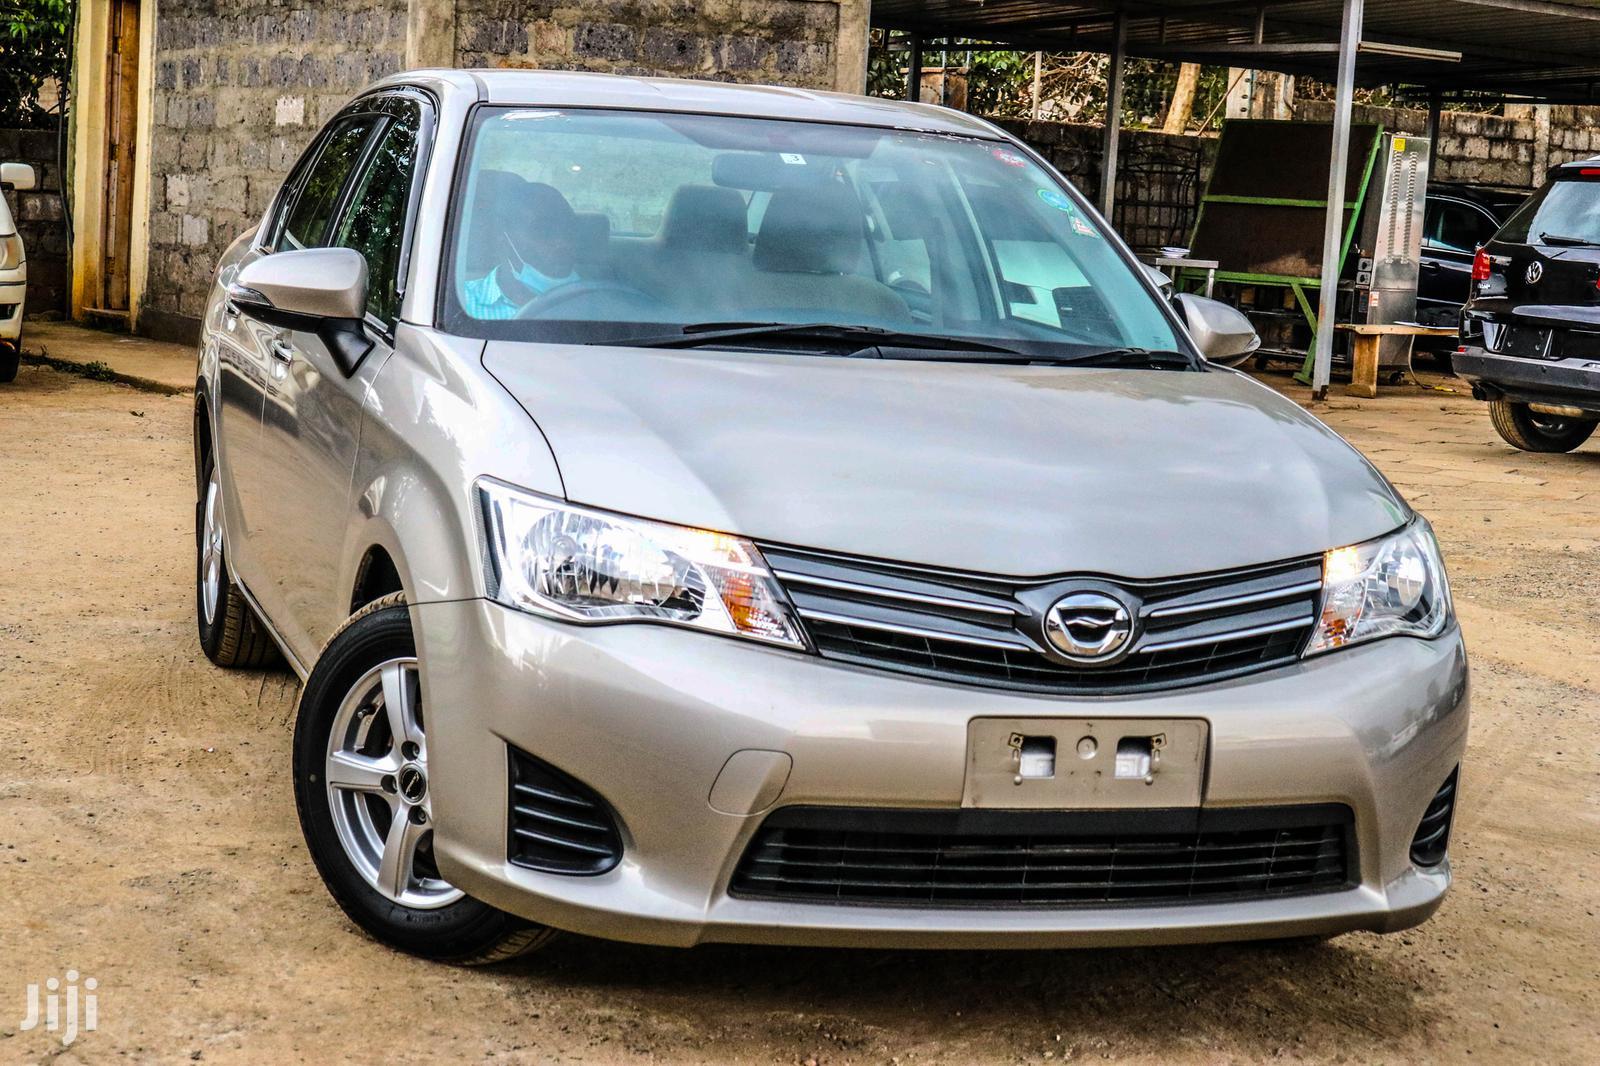 Toyota Corolla 2013 Gold | Cars for sale in Runda, Nairobi, Kenya